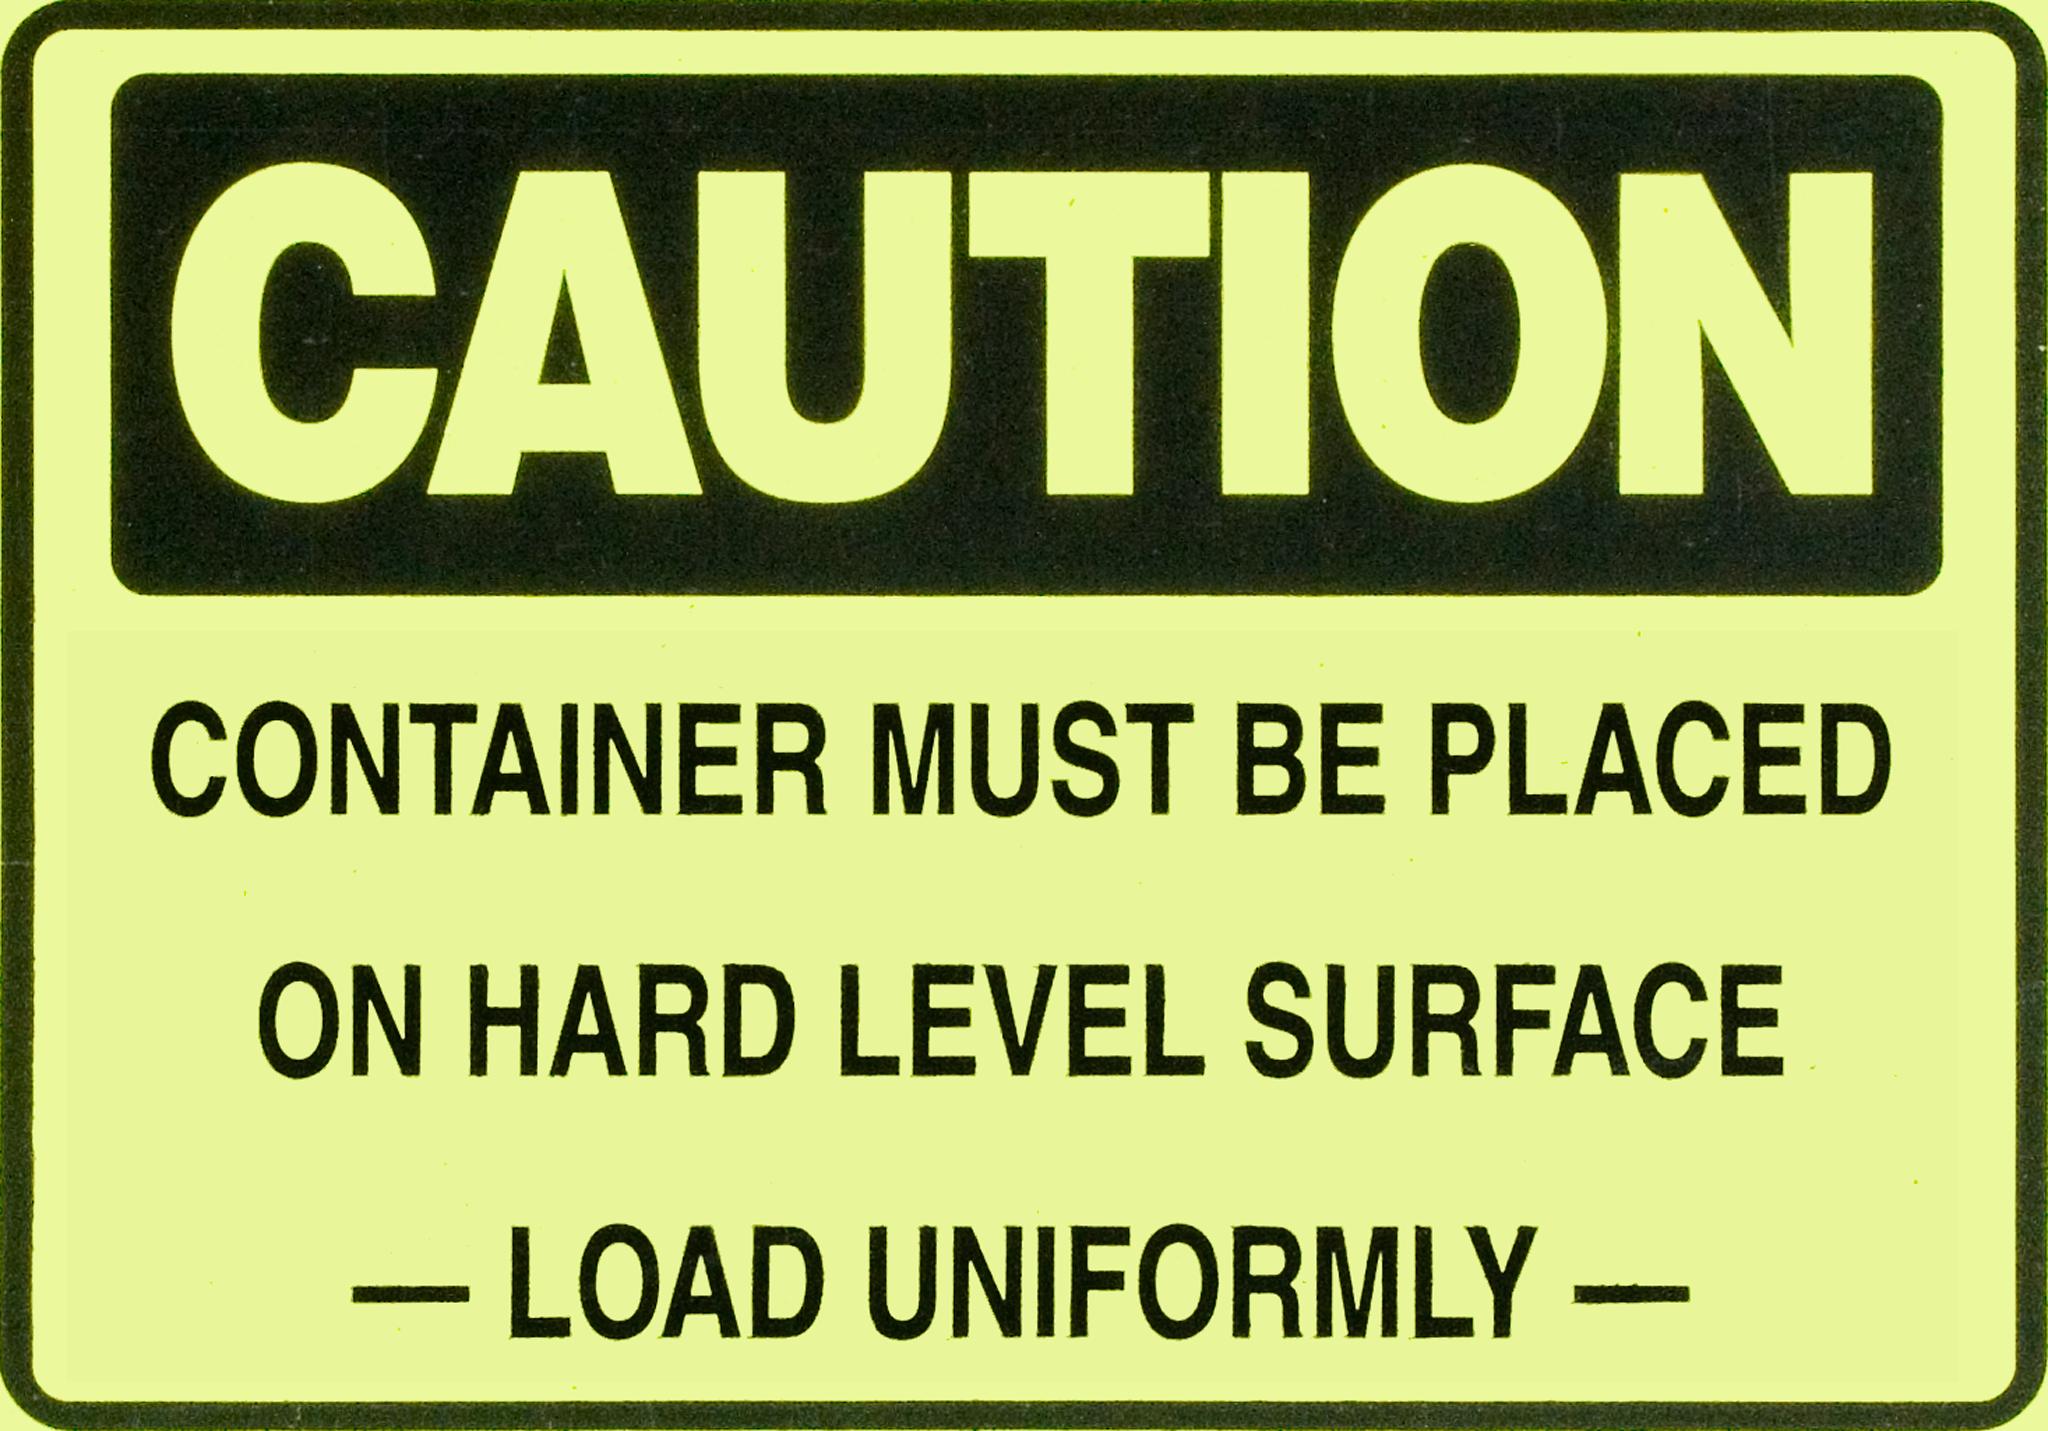 Caution Load Uniformly.png